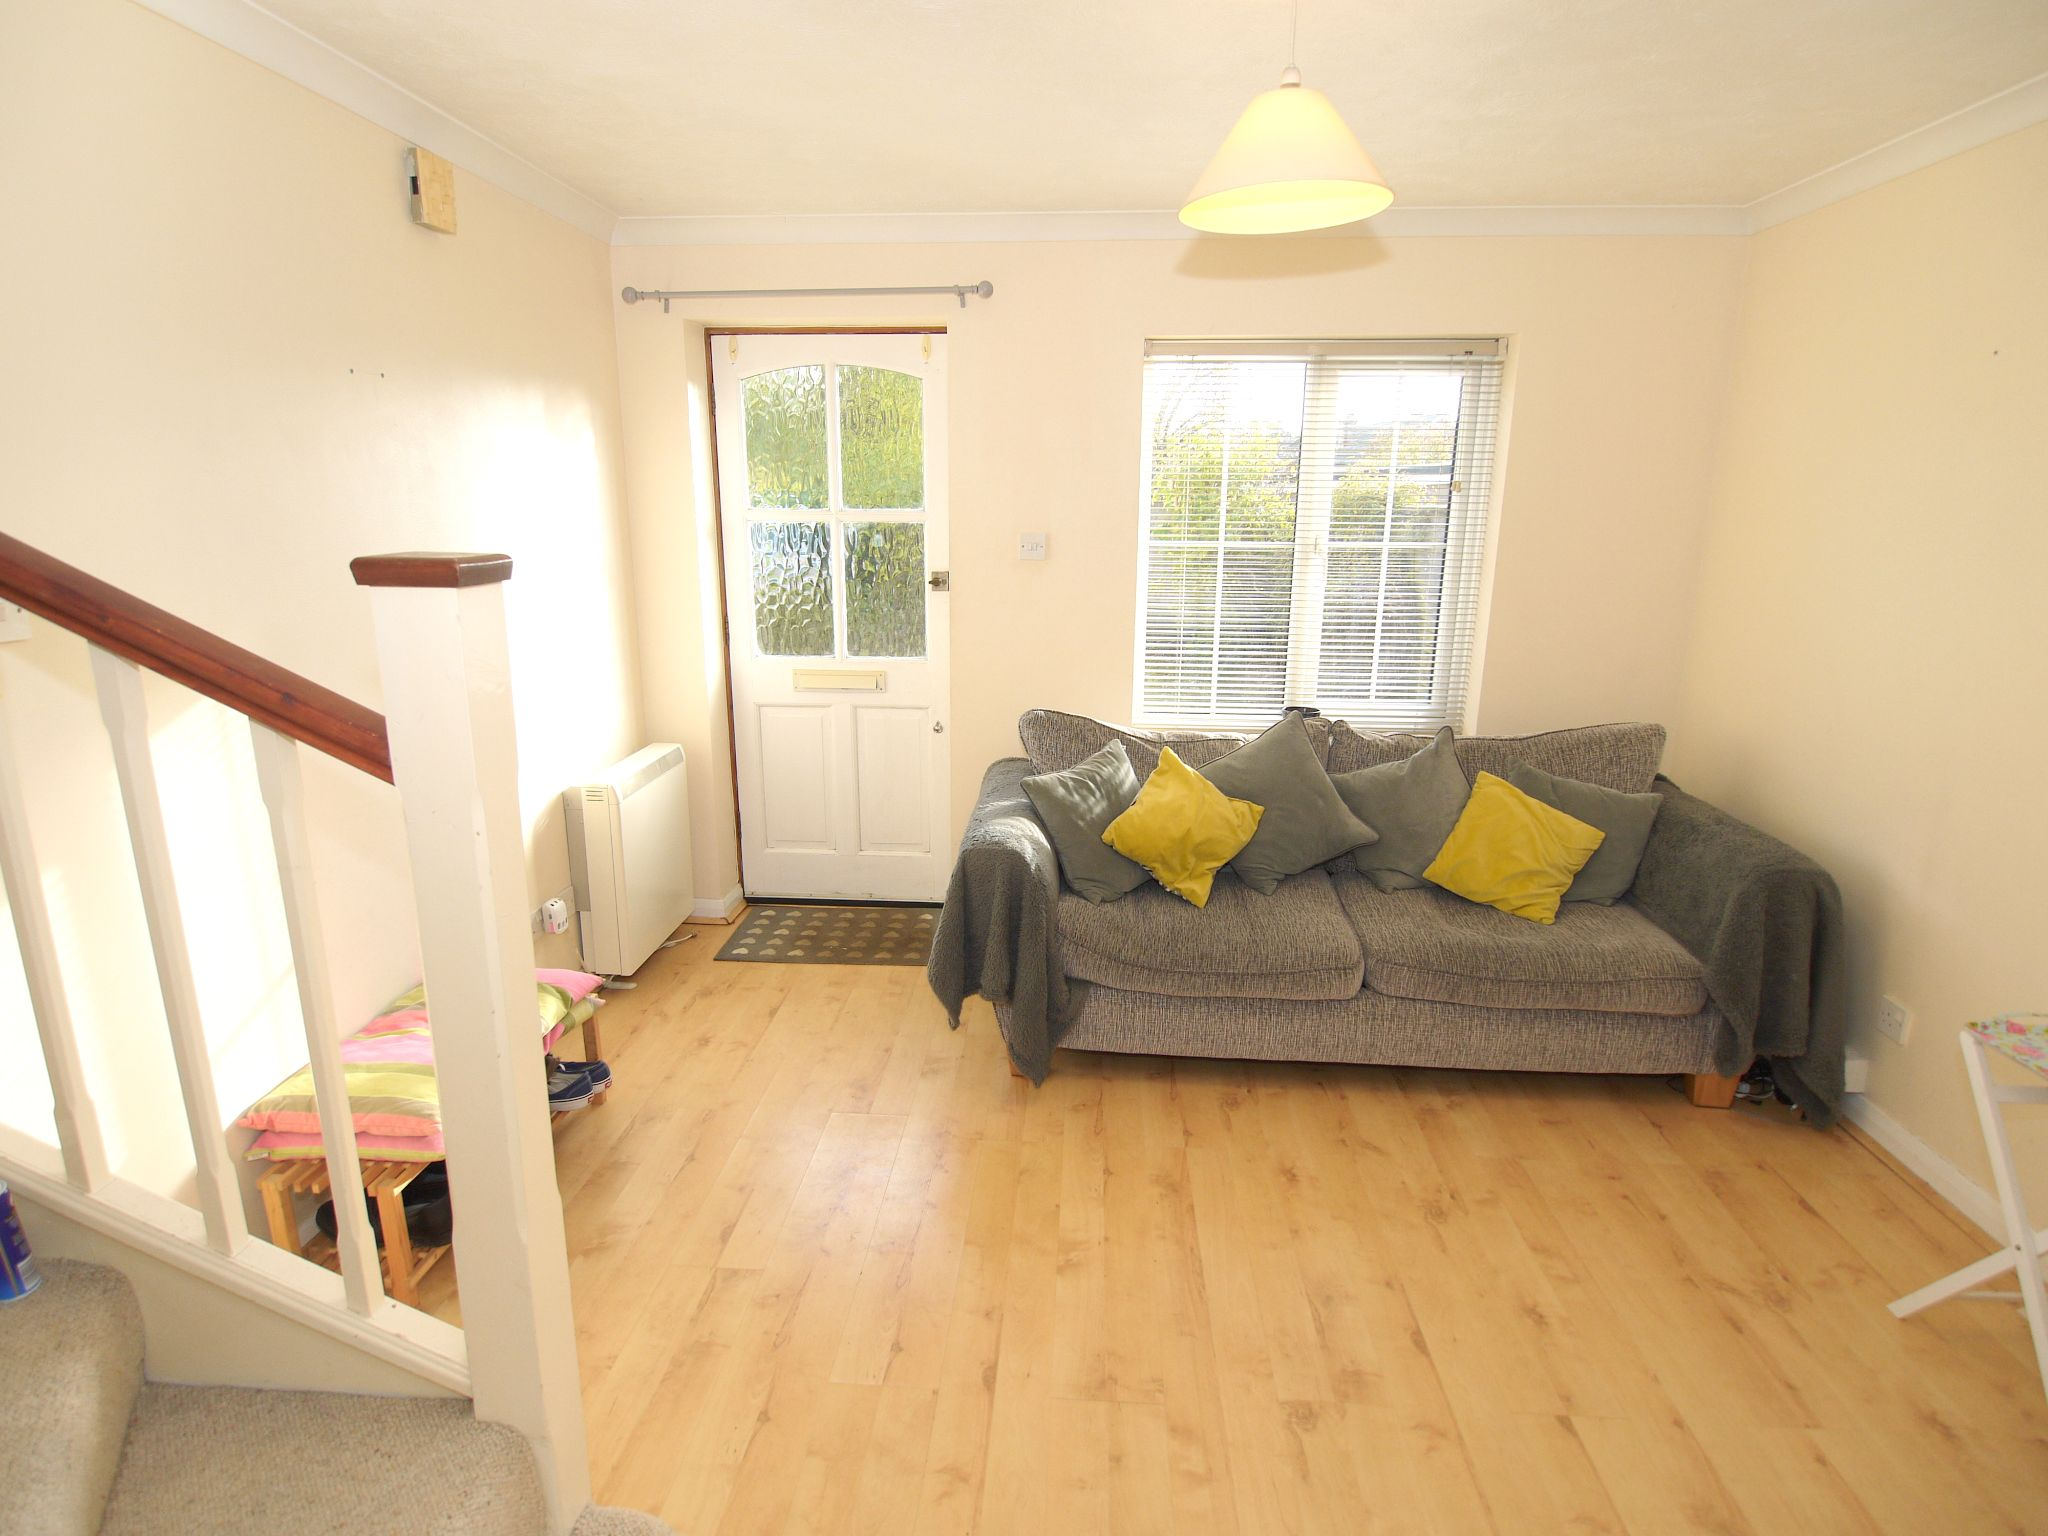 1 bedroom flat Sold in Sevenoaks - Photograph 2